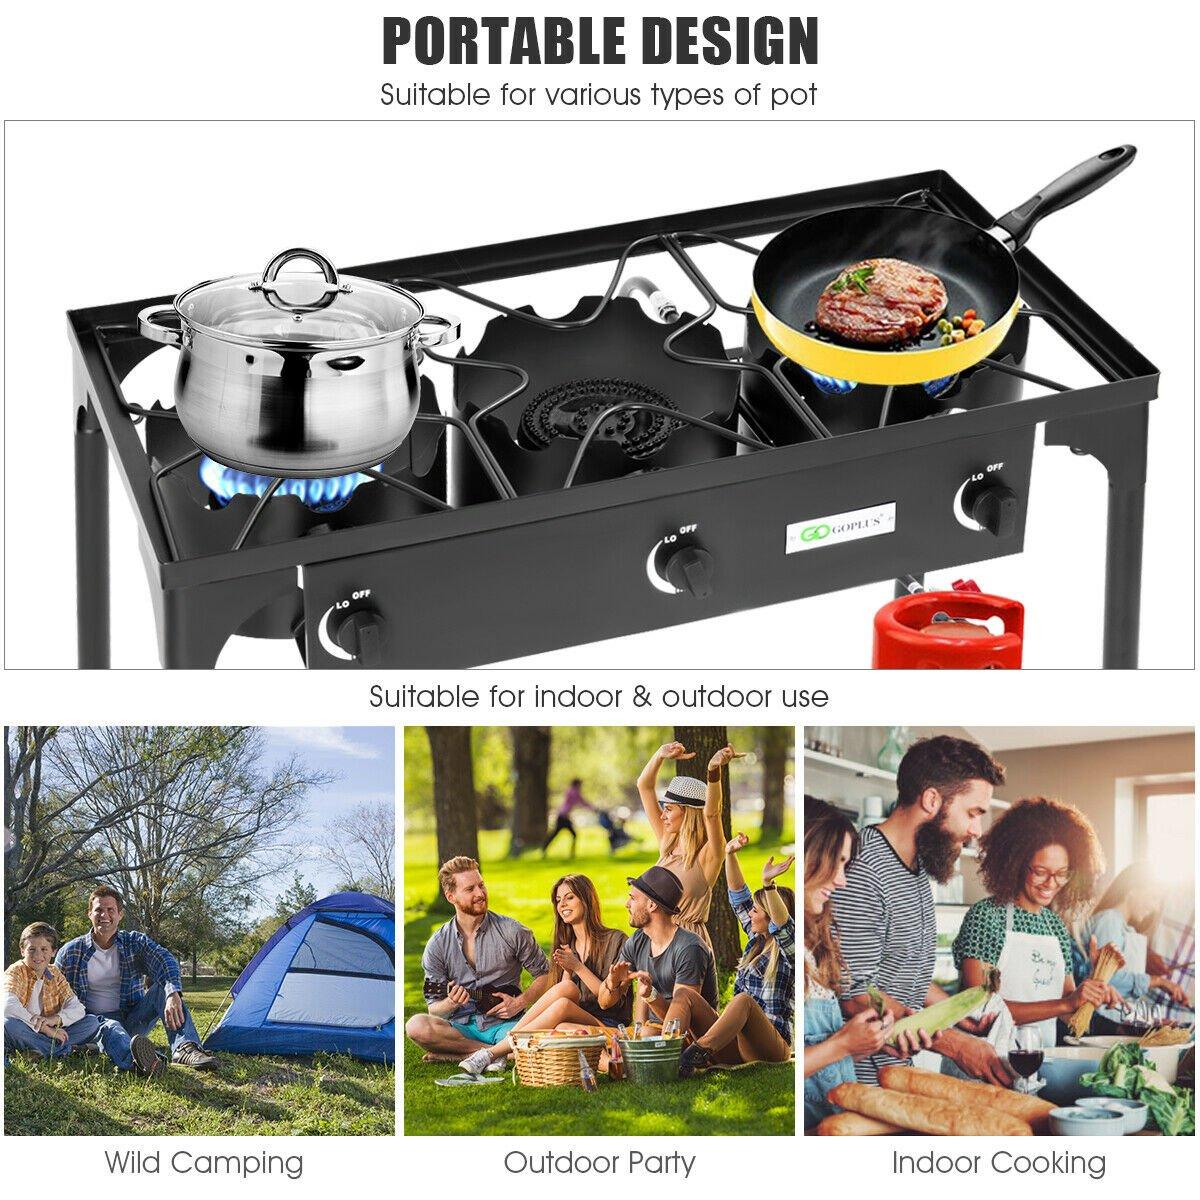 $119.99 (REG.  $199.99) – Goplus Portable Propane 225,000-BTU 3 Burner Gas Cooker Outdoor Camp Stove BBQ